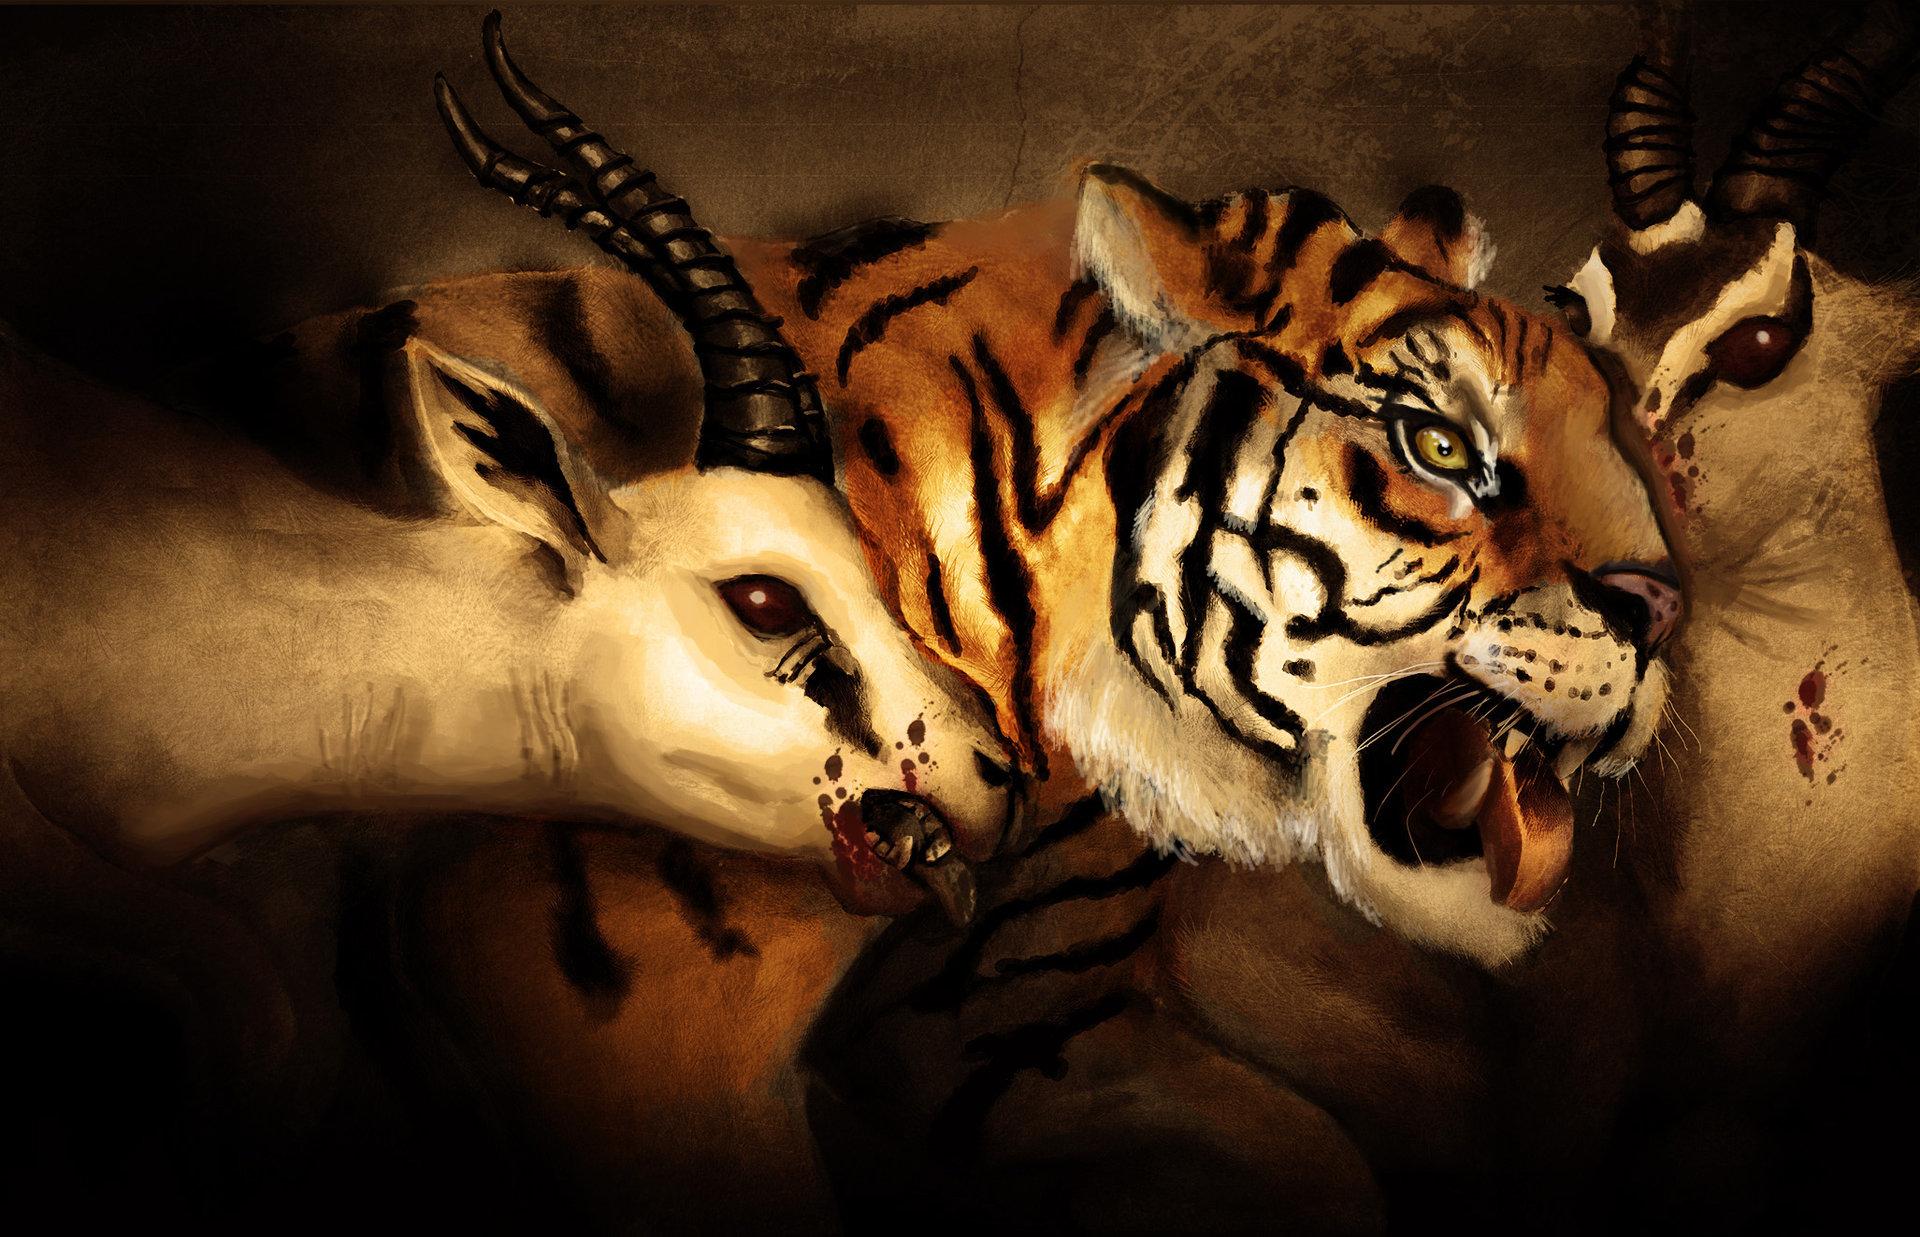 Ali maher animal f9